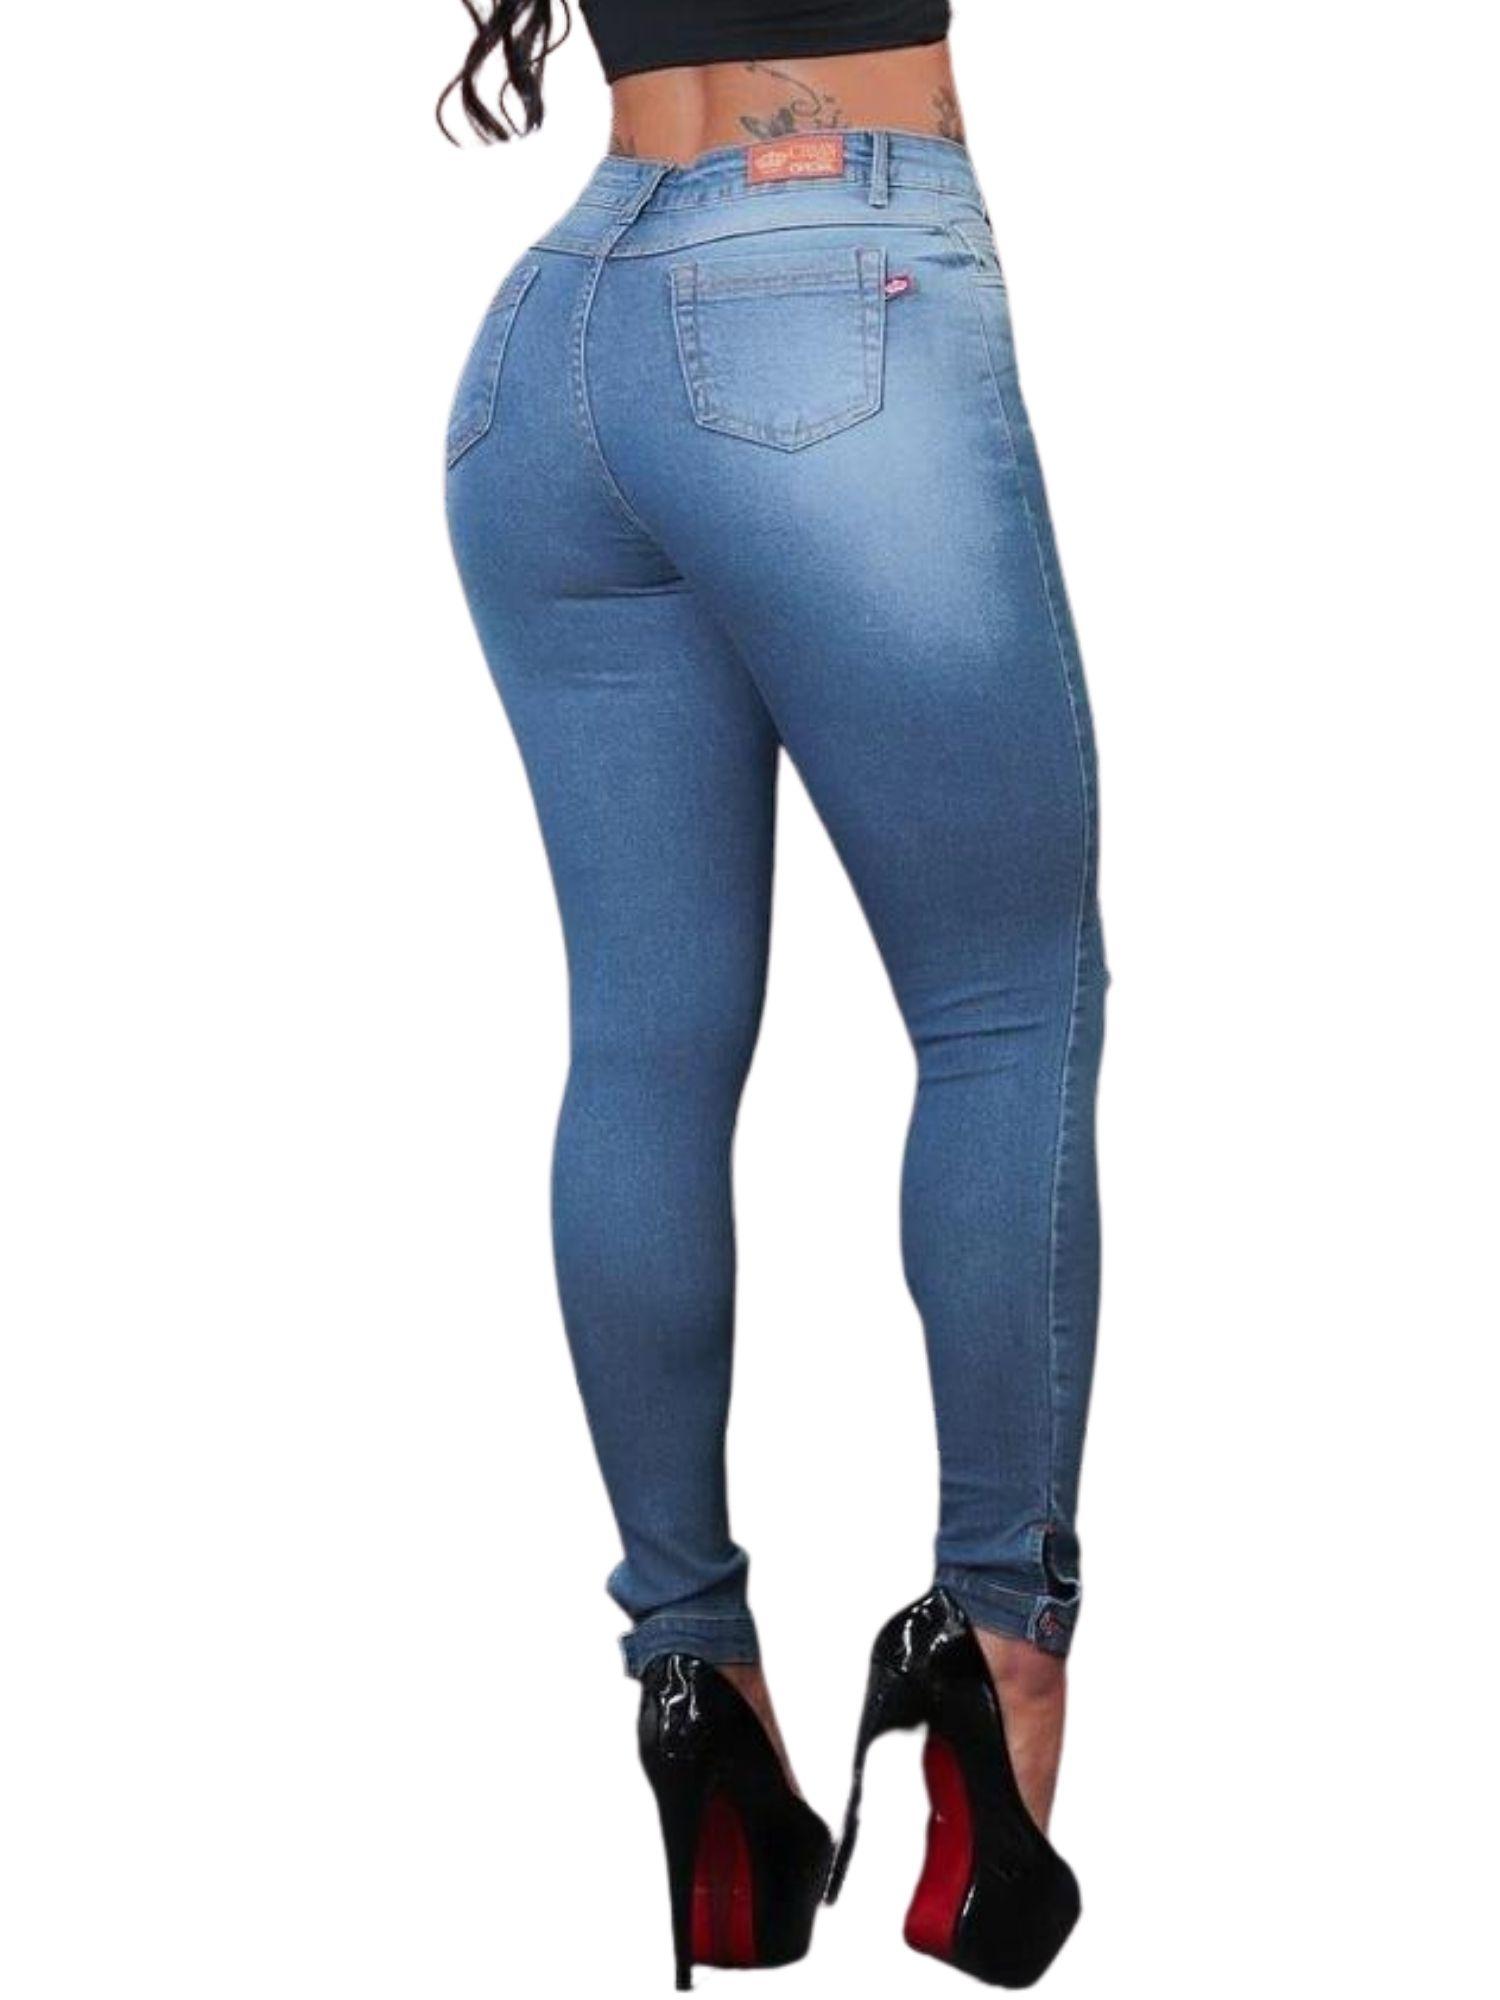 Calça Feminina Jeans Carmen 1021